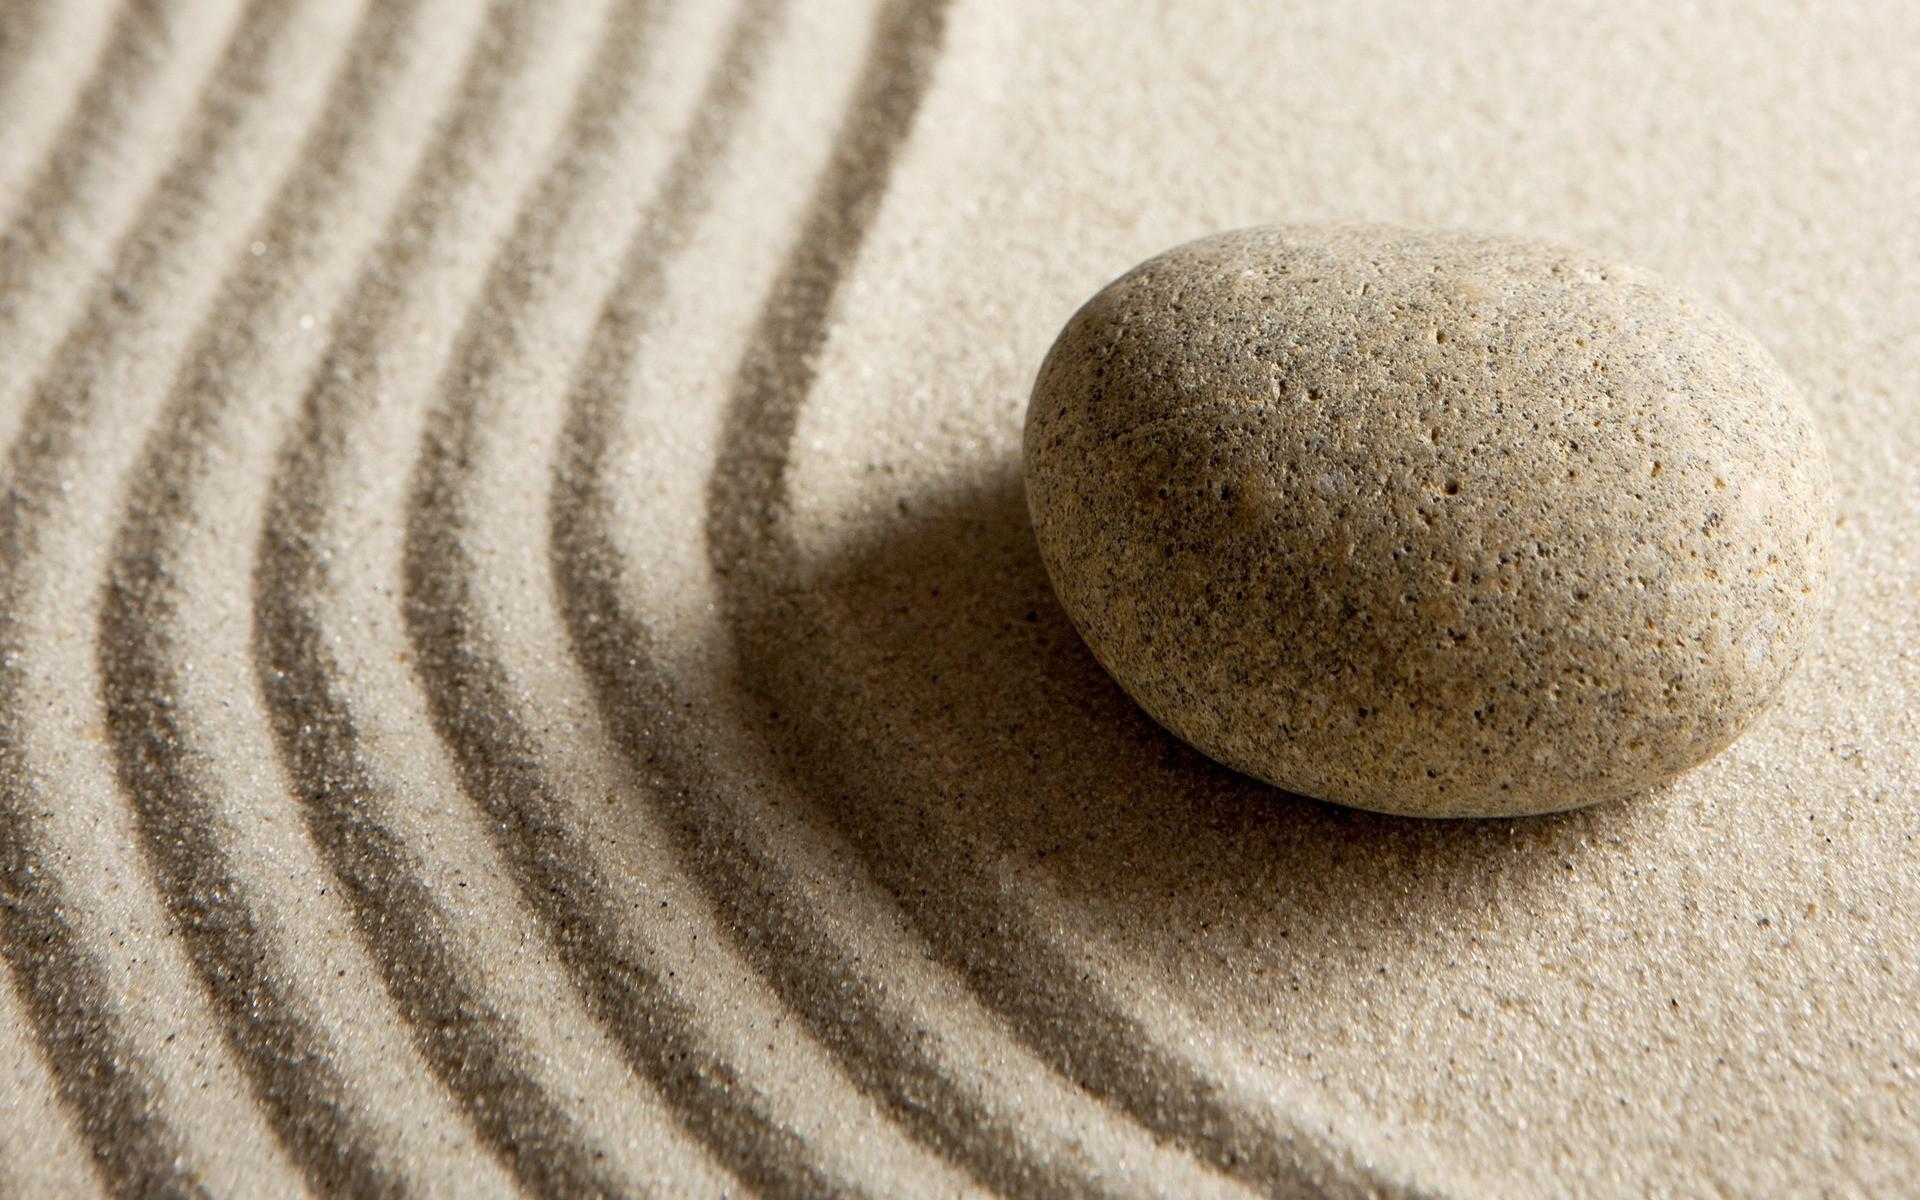 Hd wallpaper zen - Zen Fonds D Cran Arri Res Plan 1920x1200 Id 235209